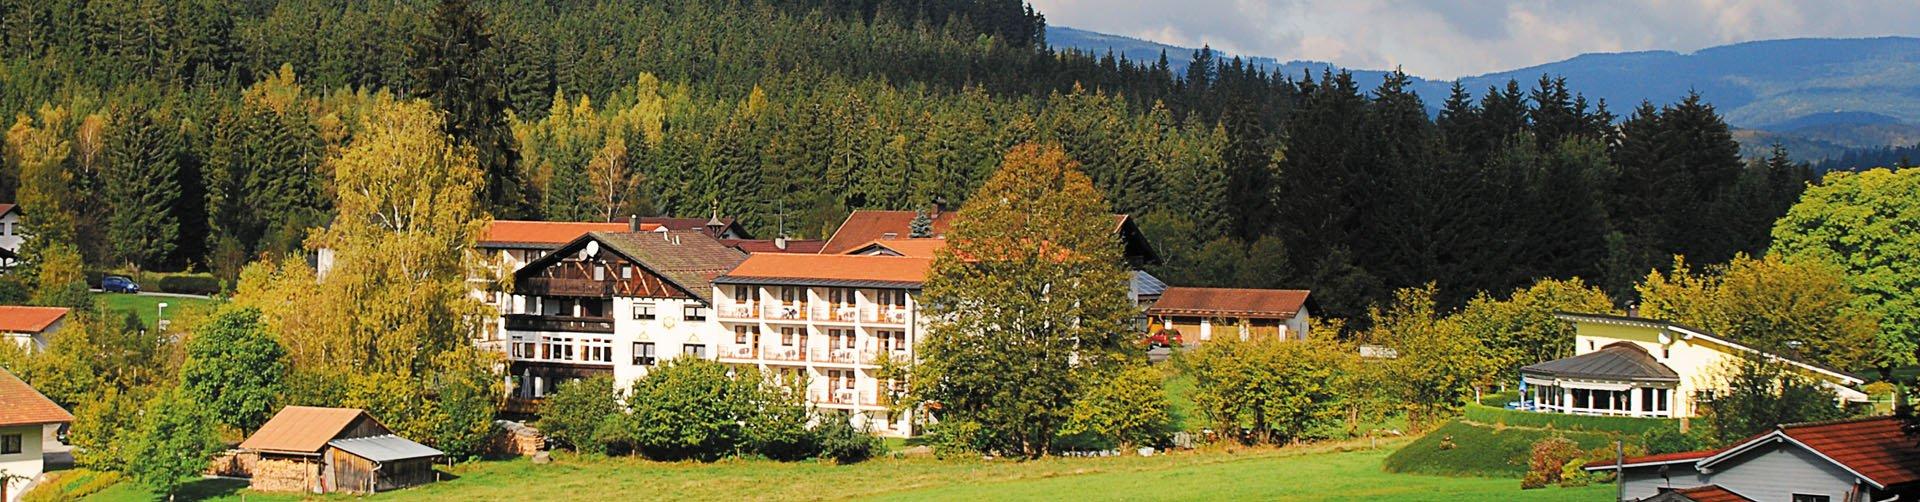 Hotel Riesberghof